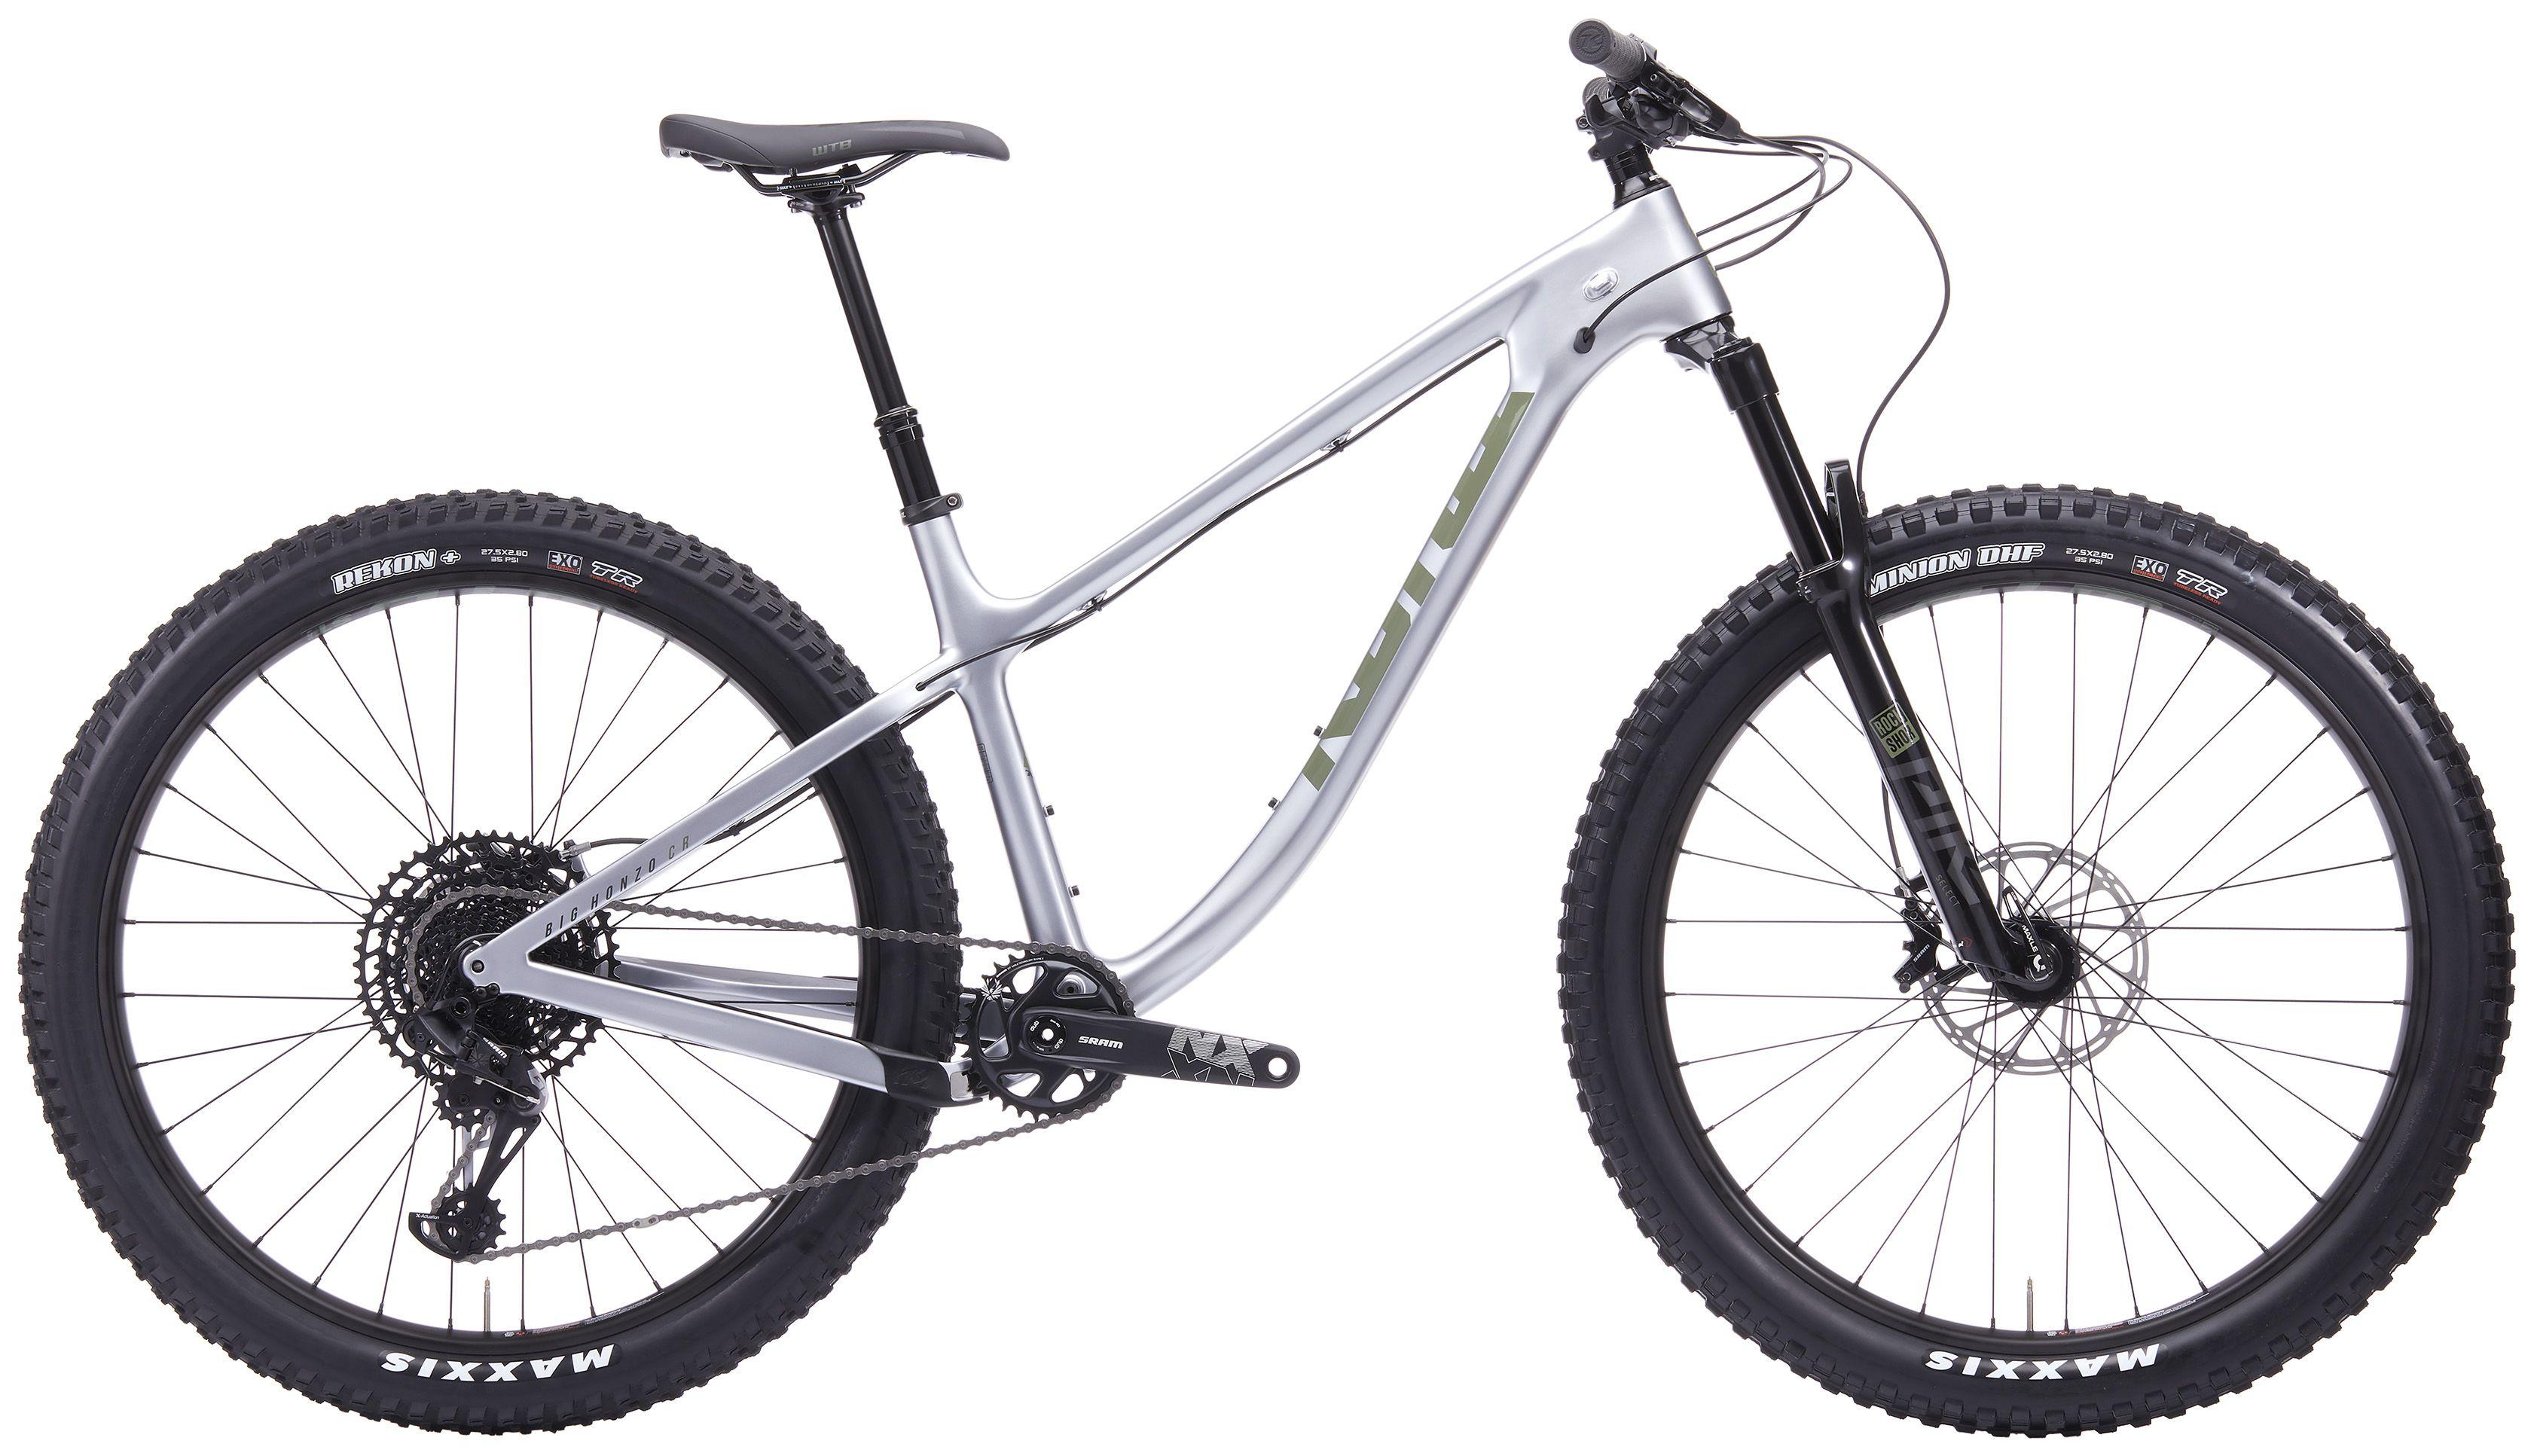 Kona Big Honzo Cr 650b Mountain Bike 2020 | Mountainbikes